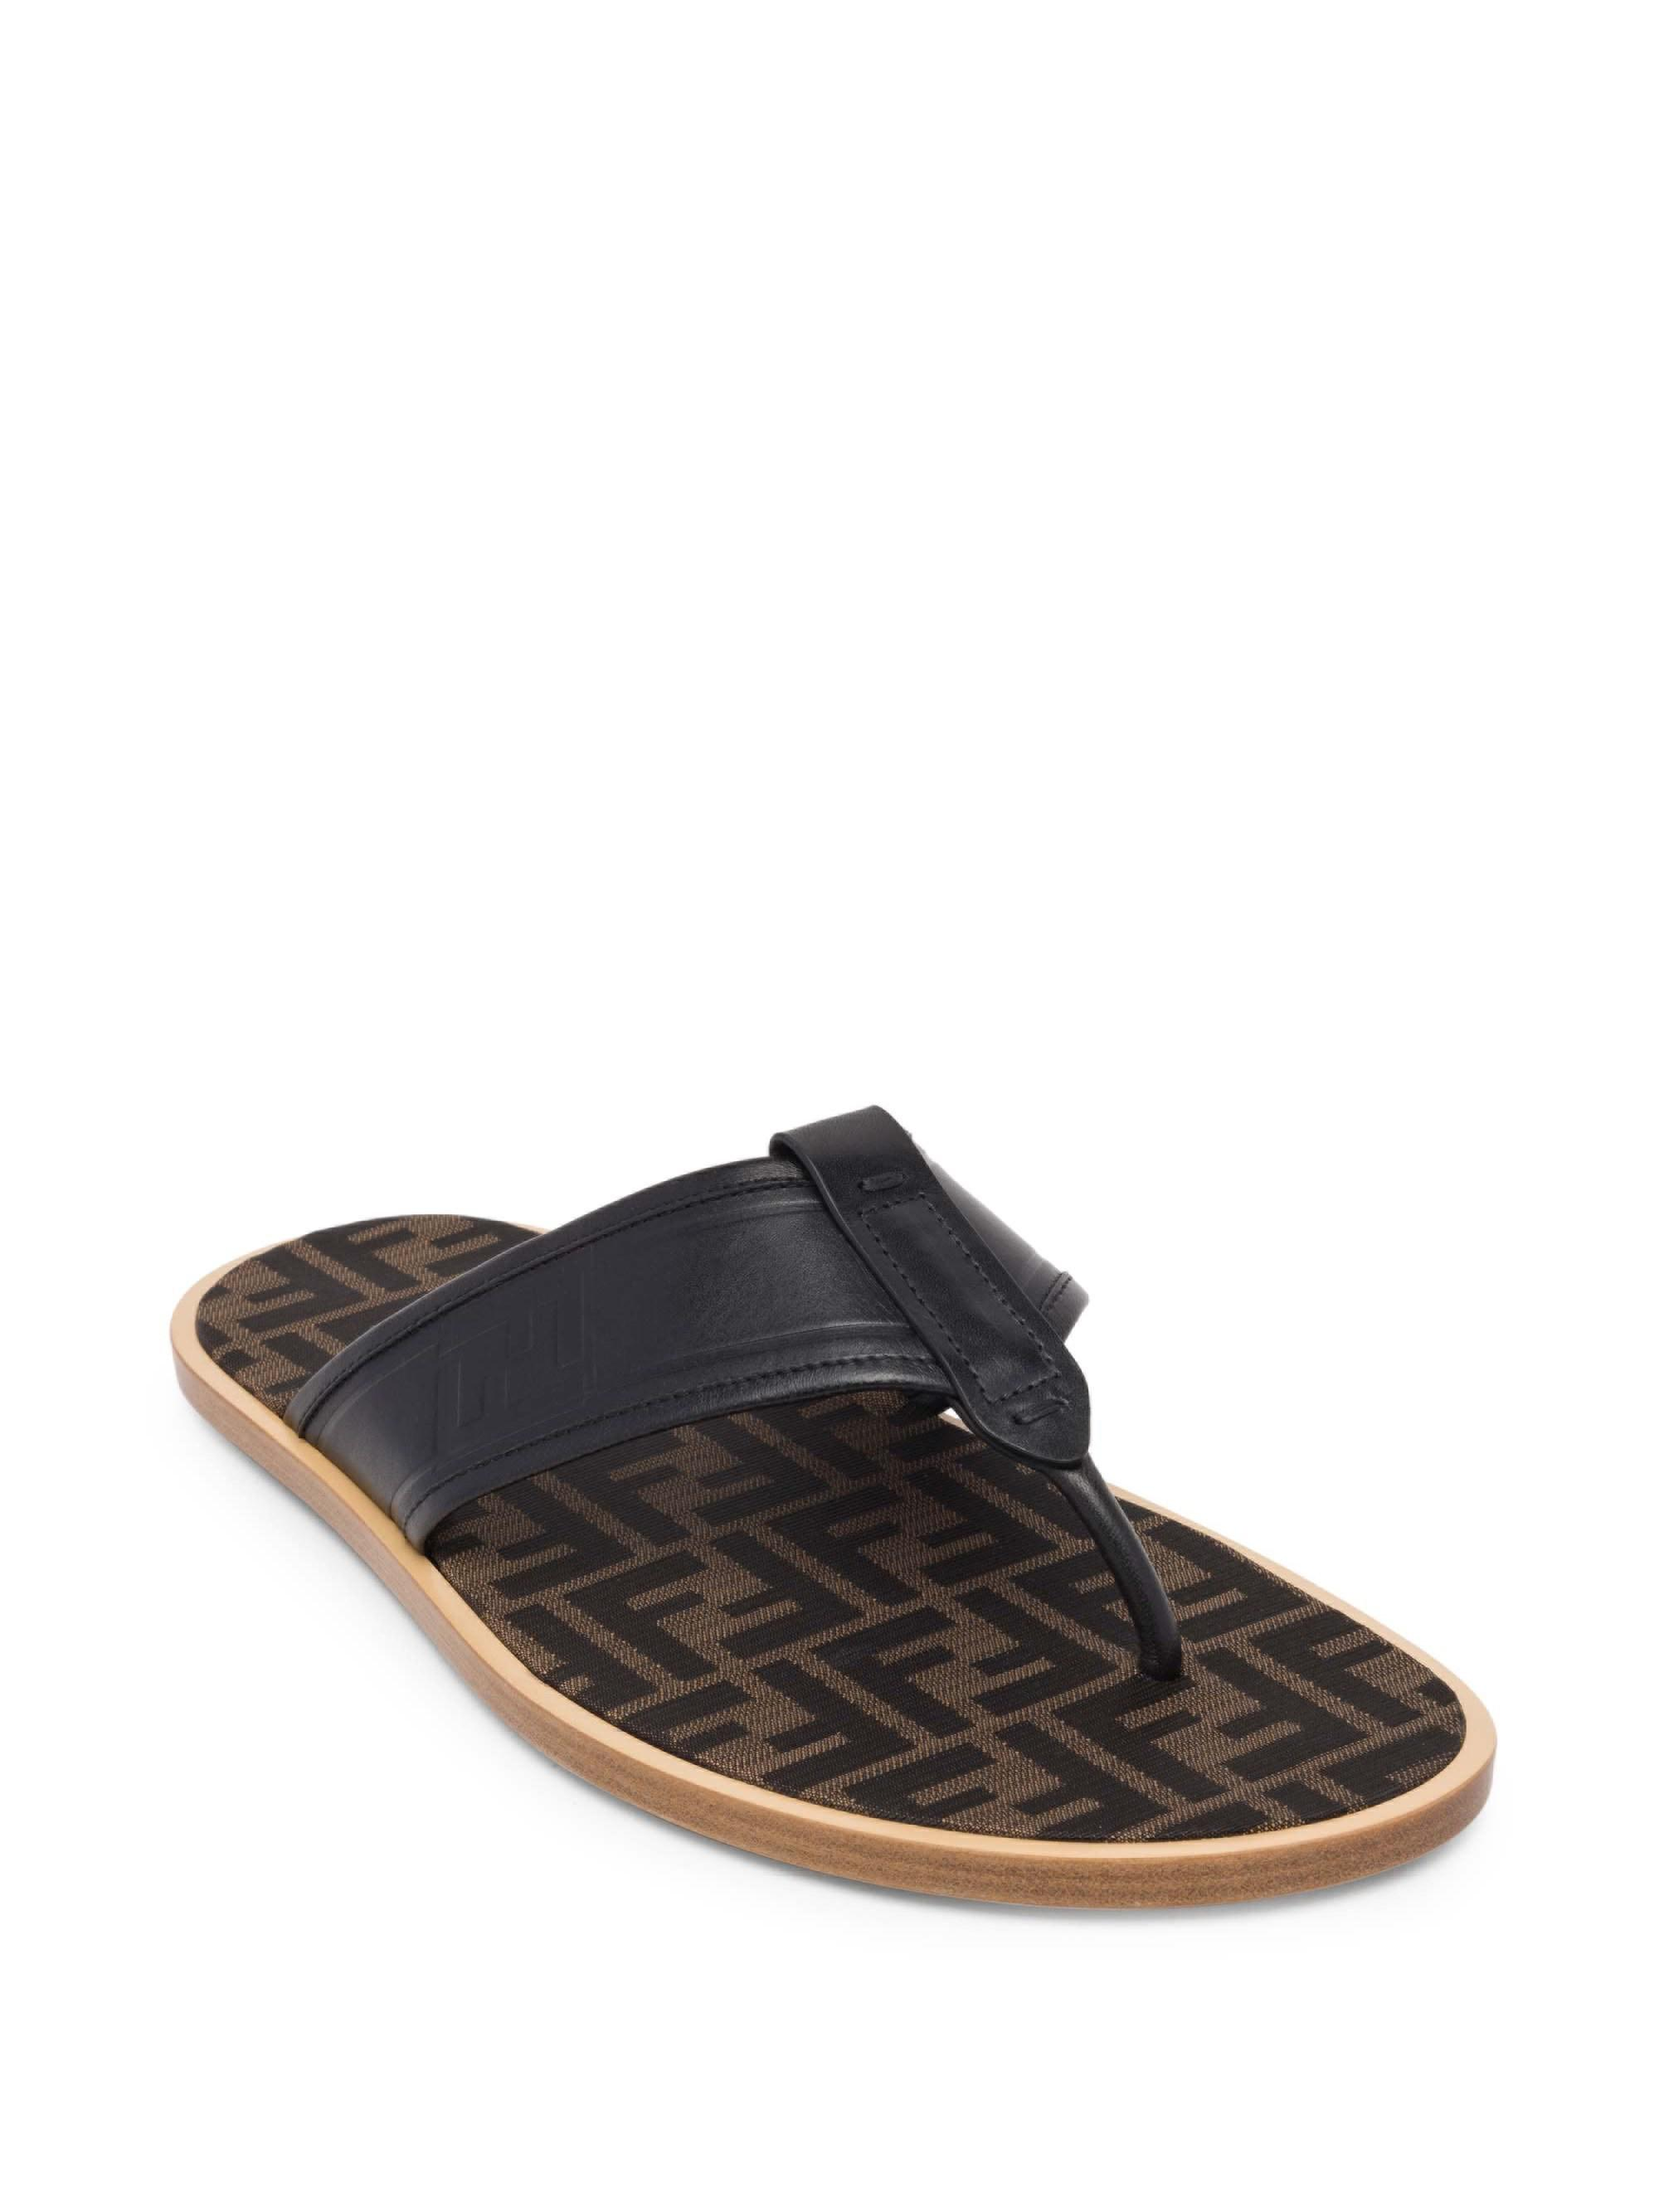 ad5a063a46c7be Fendi. Men s Black Ff Print Flip Flops.  920 From Saks Fifth Avenue